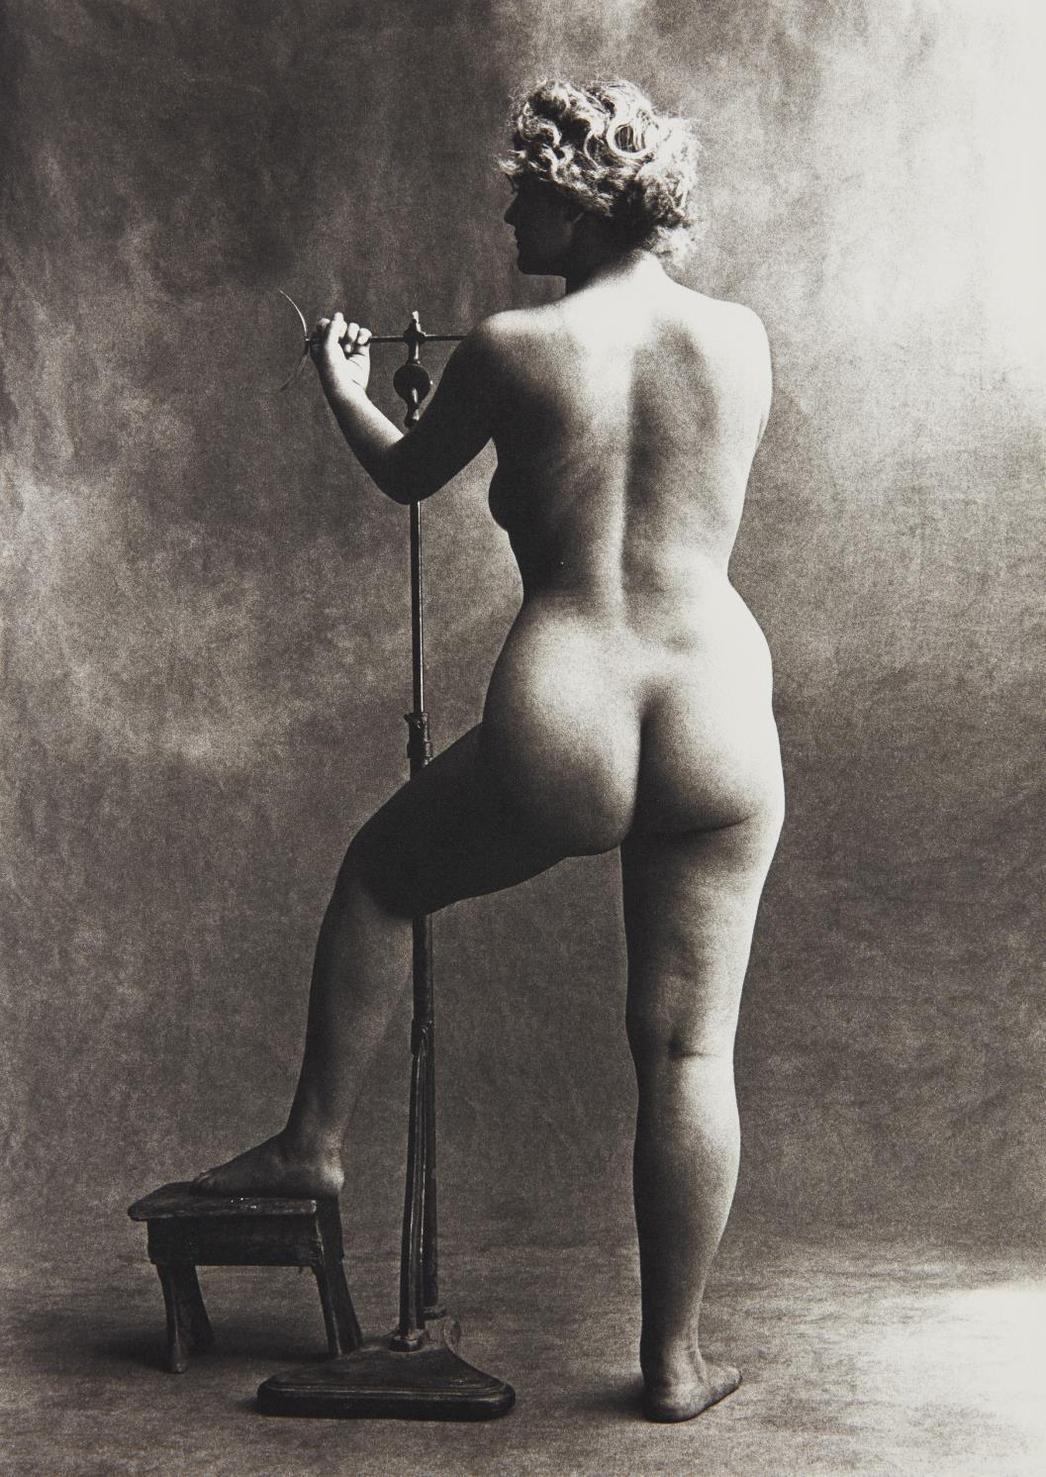 Irving Penn-Sculptors Model, Paris-1950